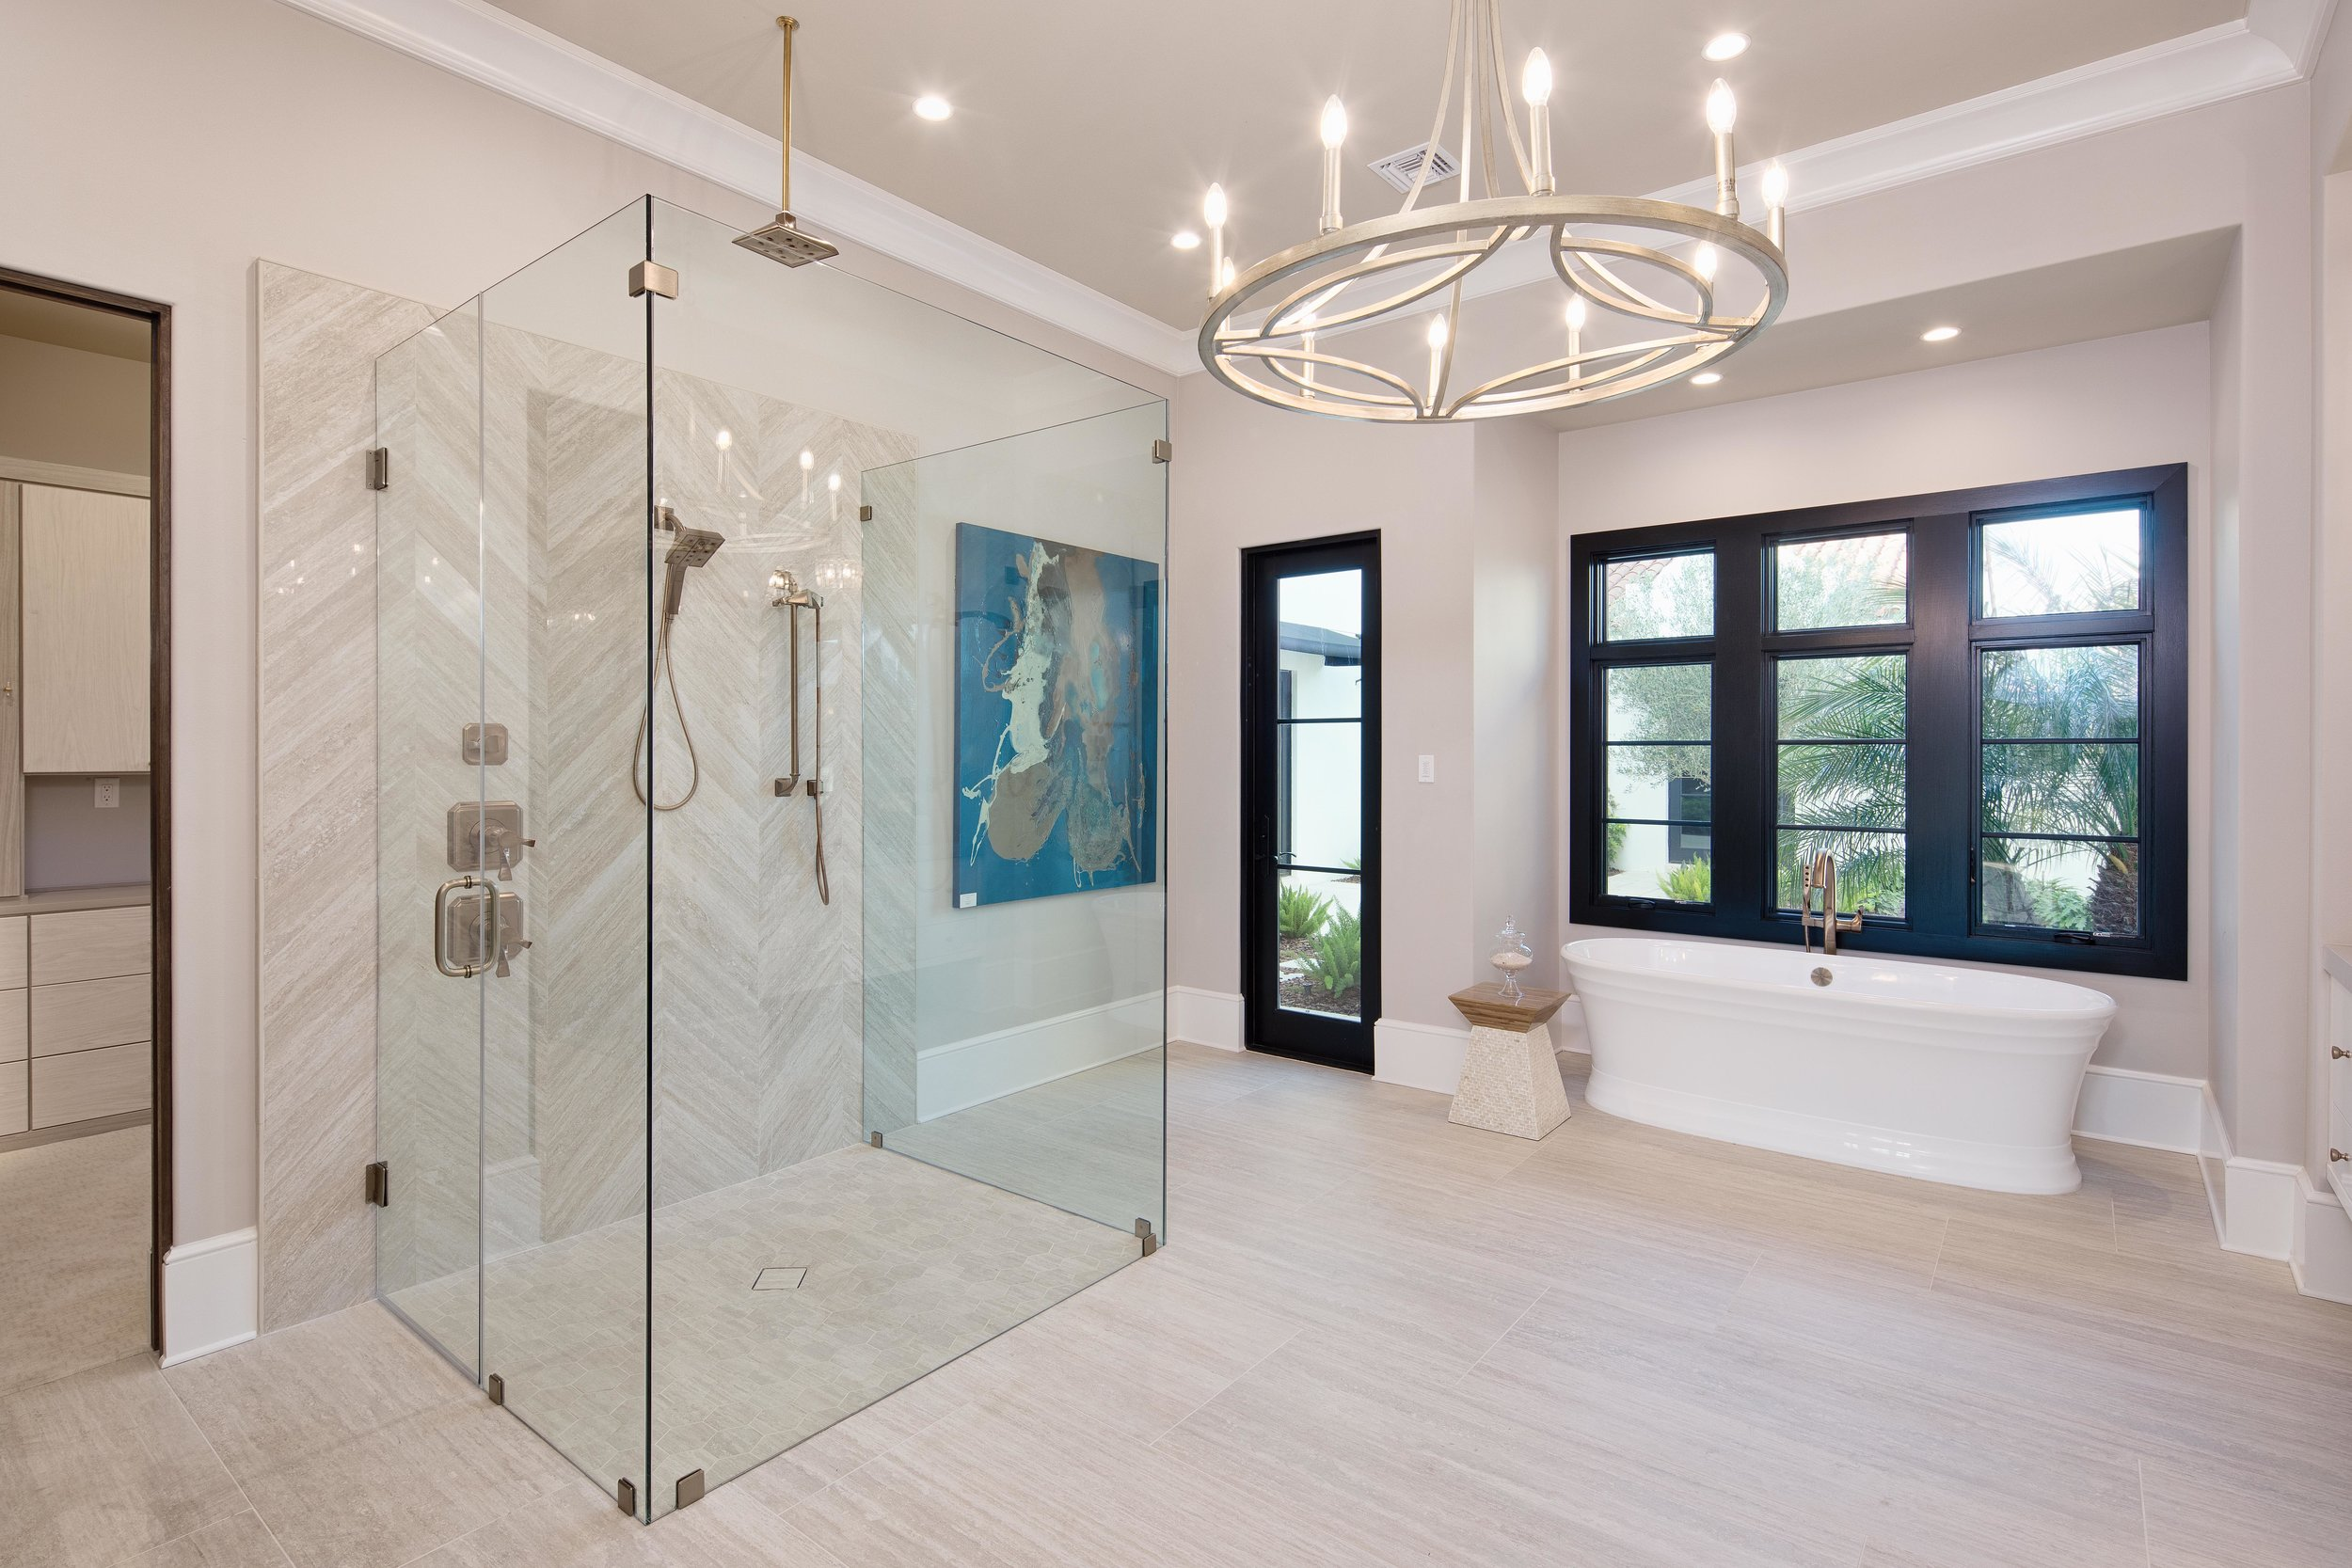 cadillac bathroom 2 (002).jpg